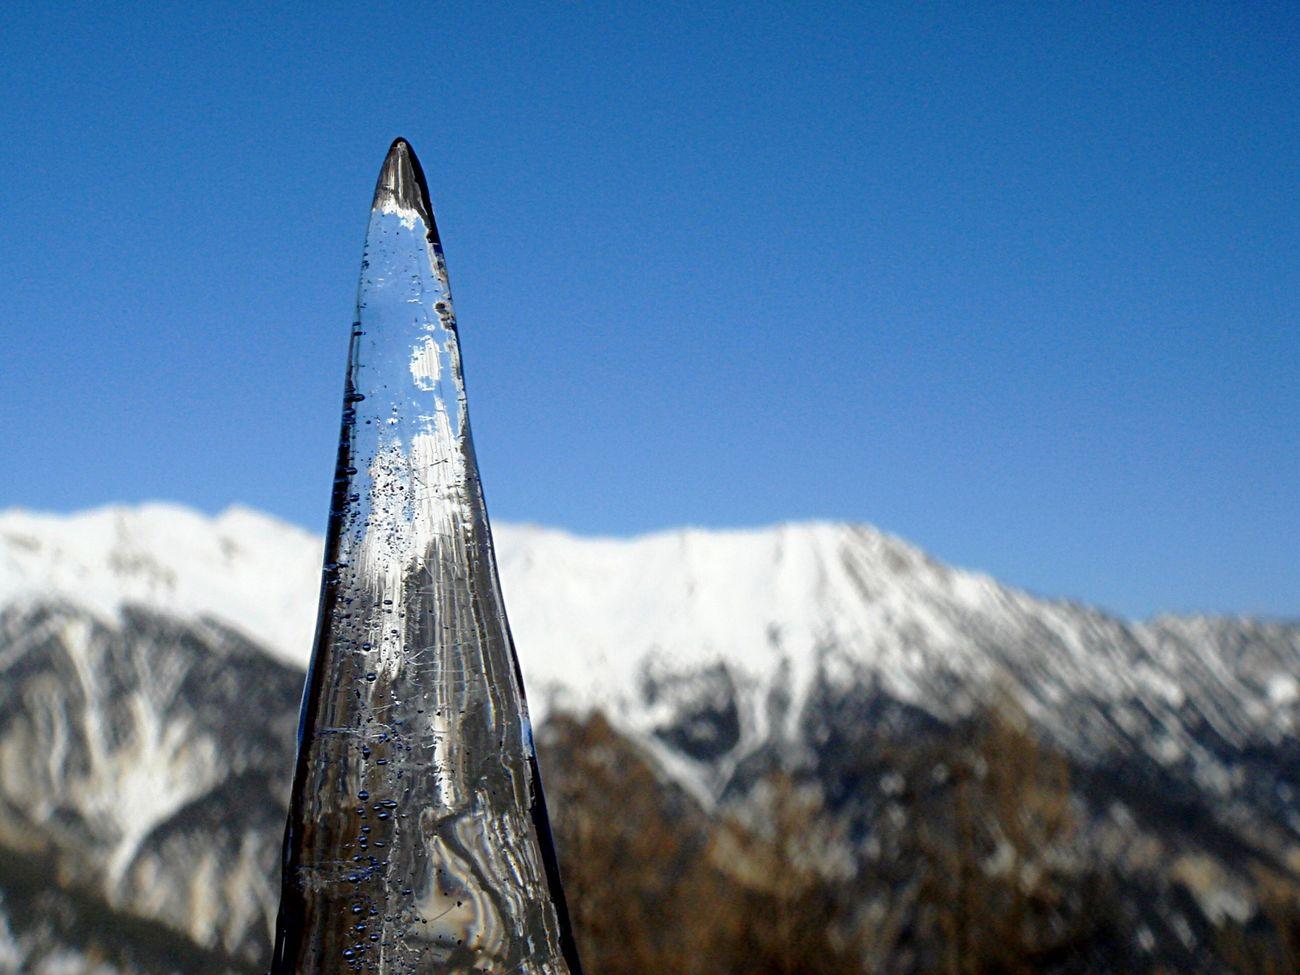 My Winter Favorites Stalactite  Mountains Snow Sky Ice Serre Chevalier